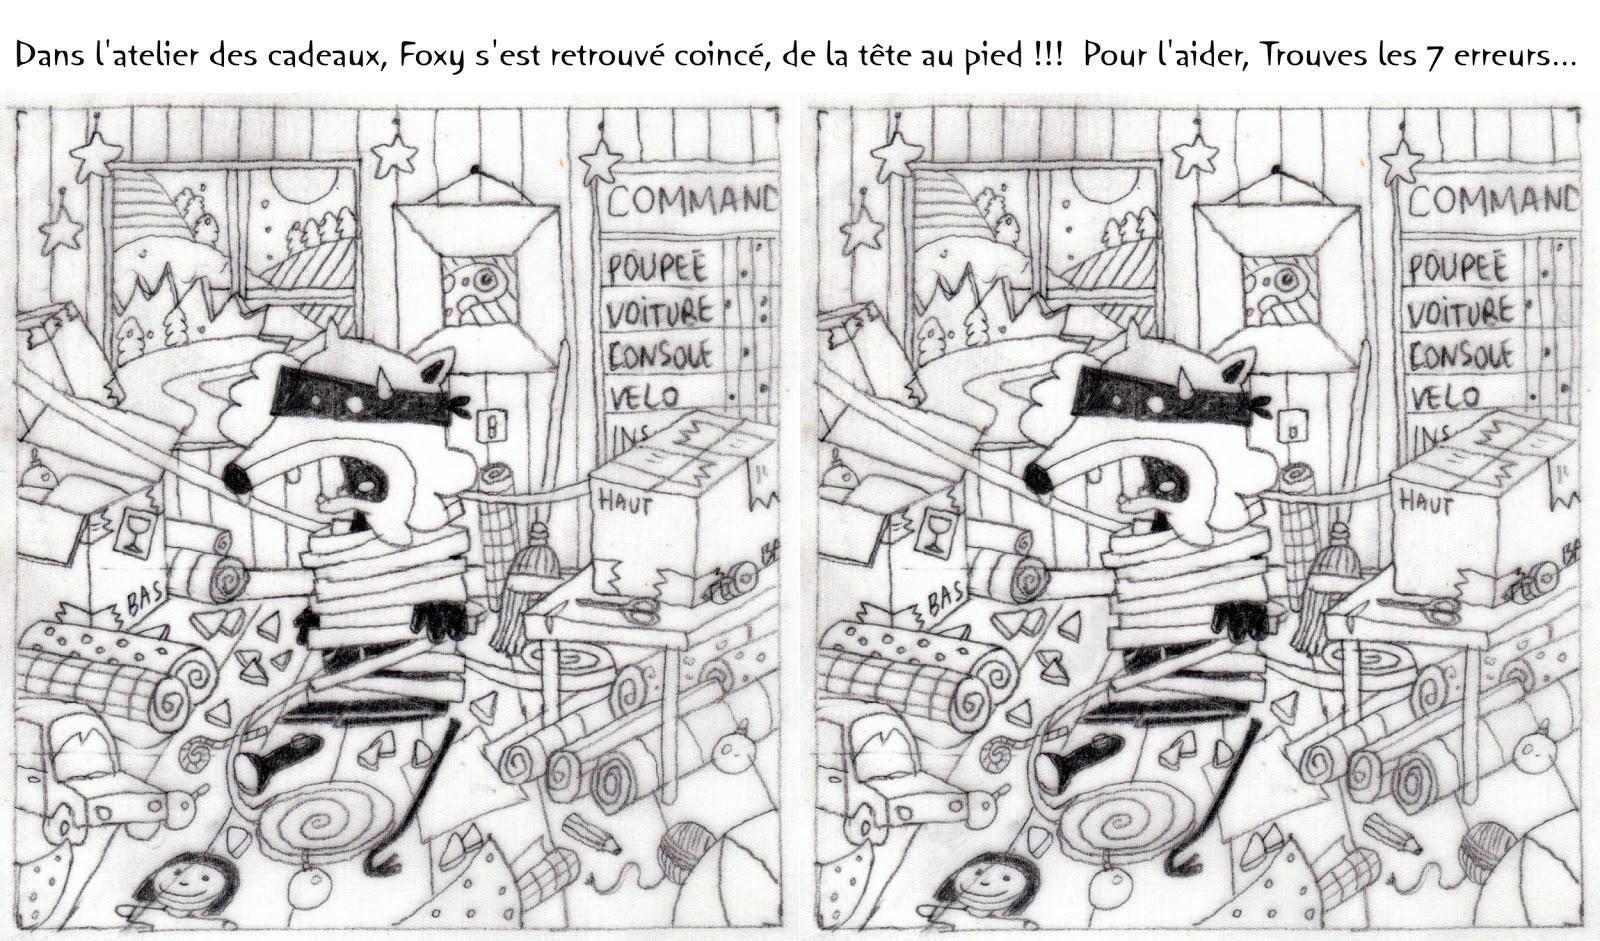 Tef graphiste illustrateur enfant 0609474204 tefgraph jeux des 7 erreurs magasine - Jeux imprimer adulte ...